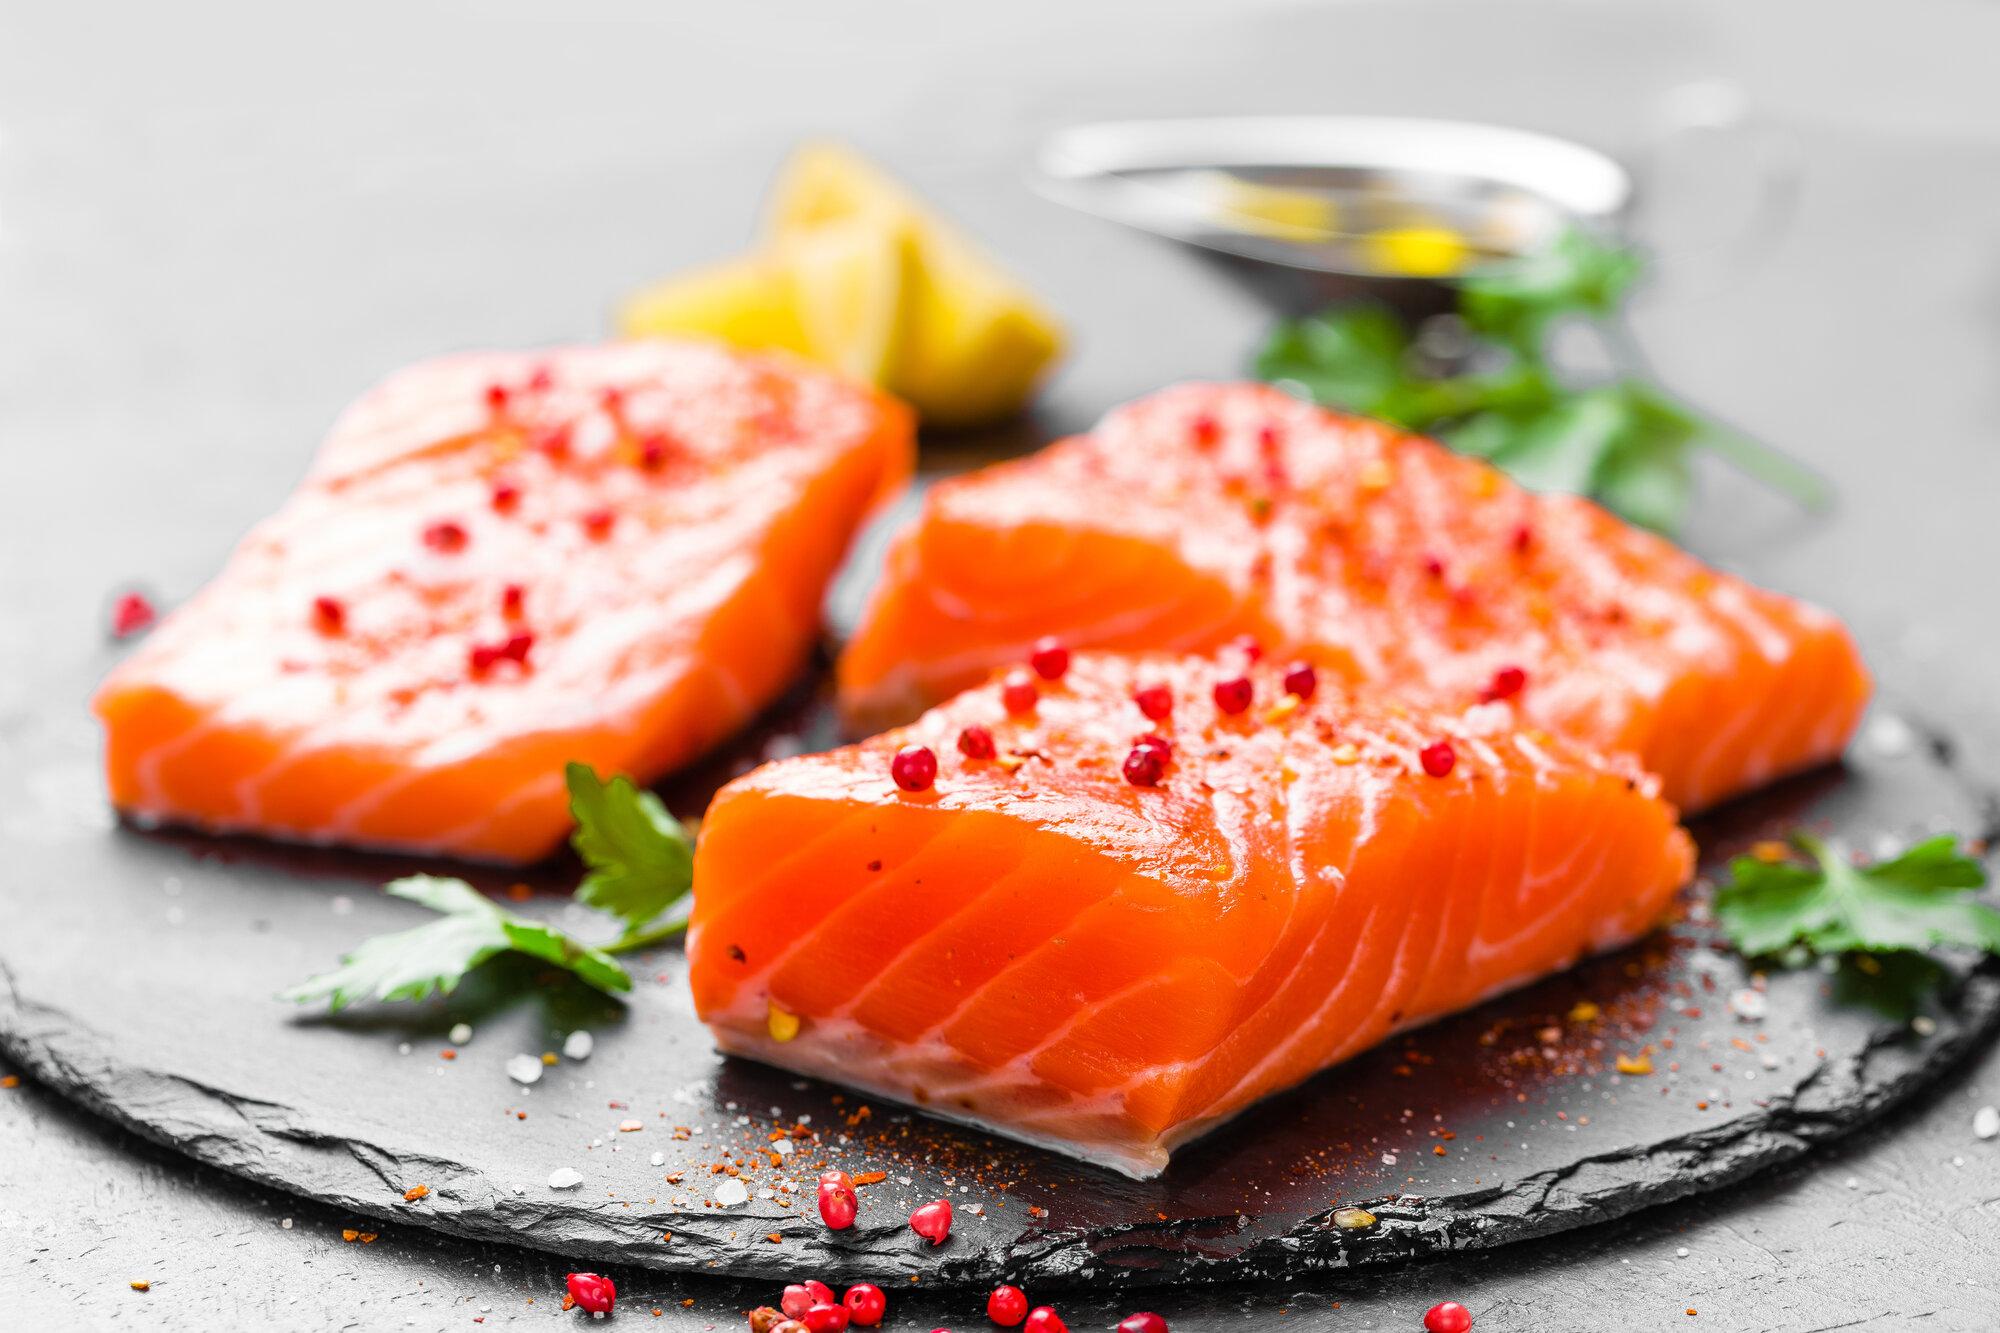 salmon fresh salmon fish raw salmon fish fillet PVSUNQG - Startseite